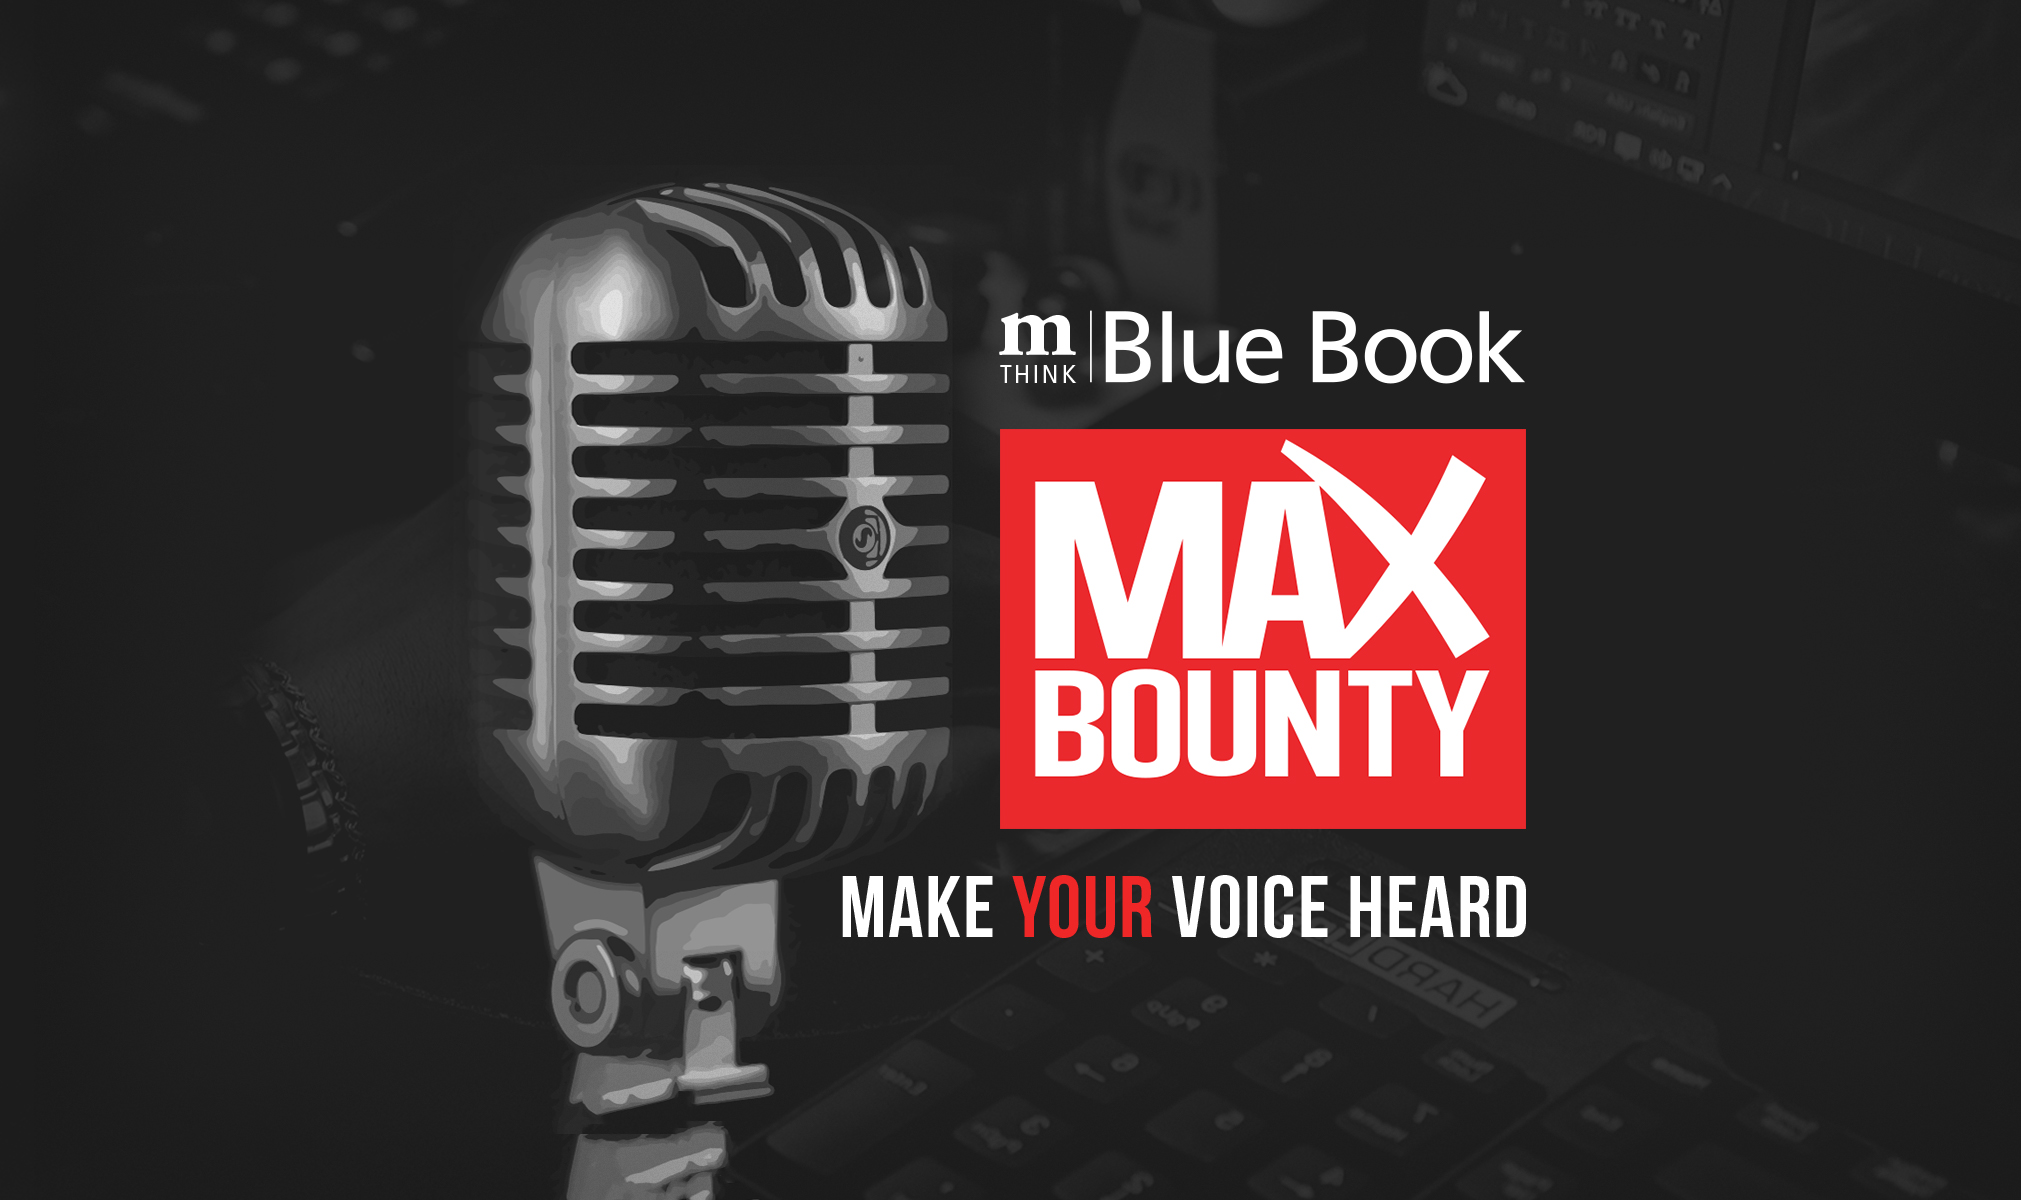 Vote MaxBounty #1 in mThink's 2019 BlueBook Top Network Survey